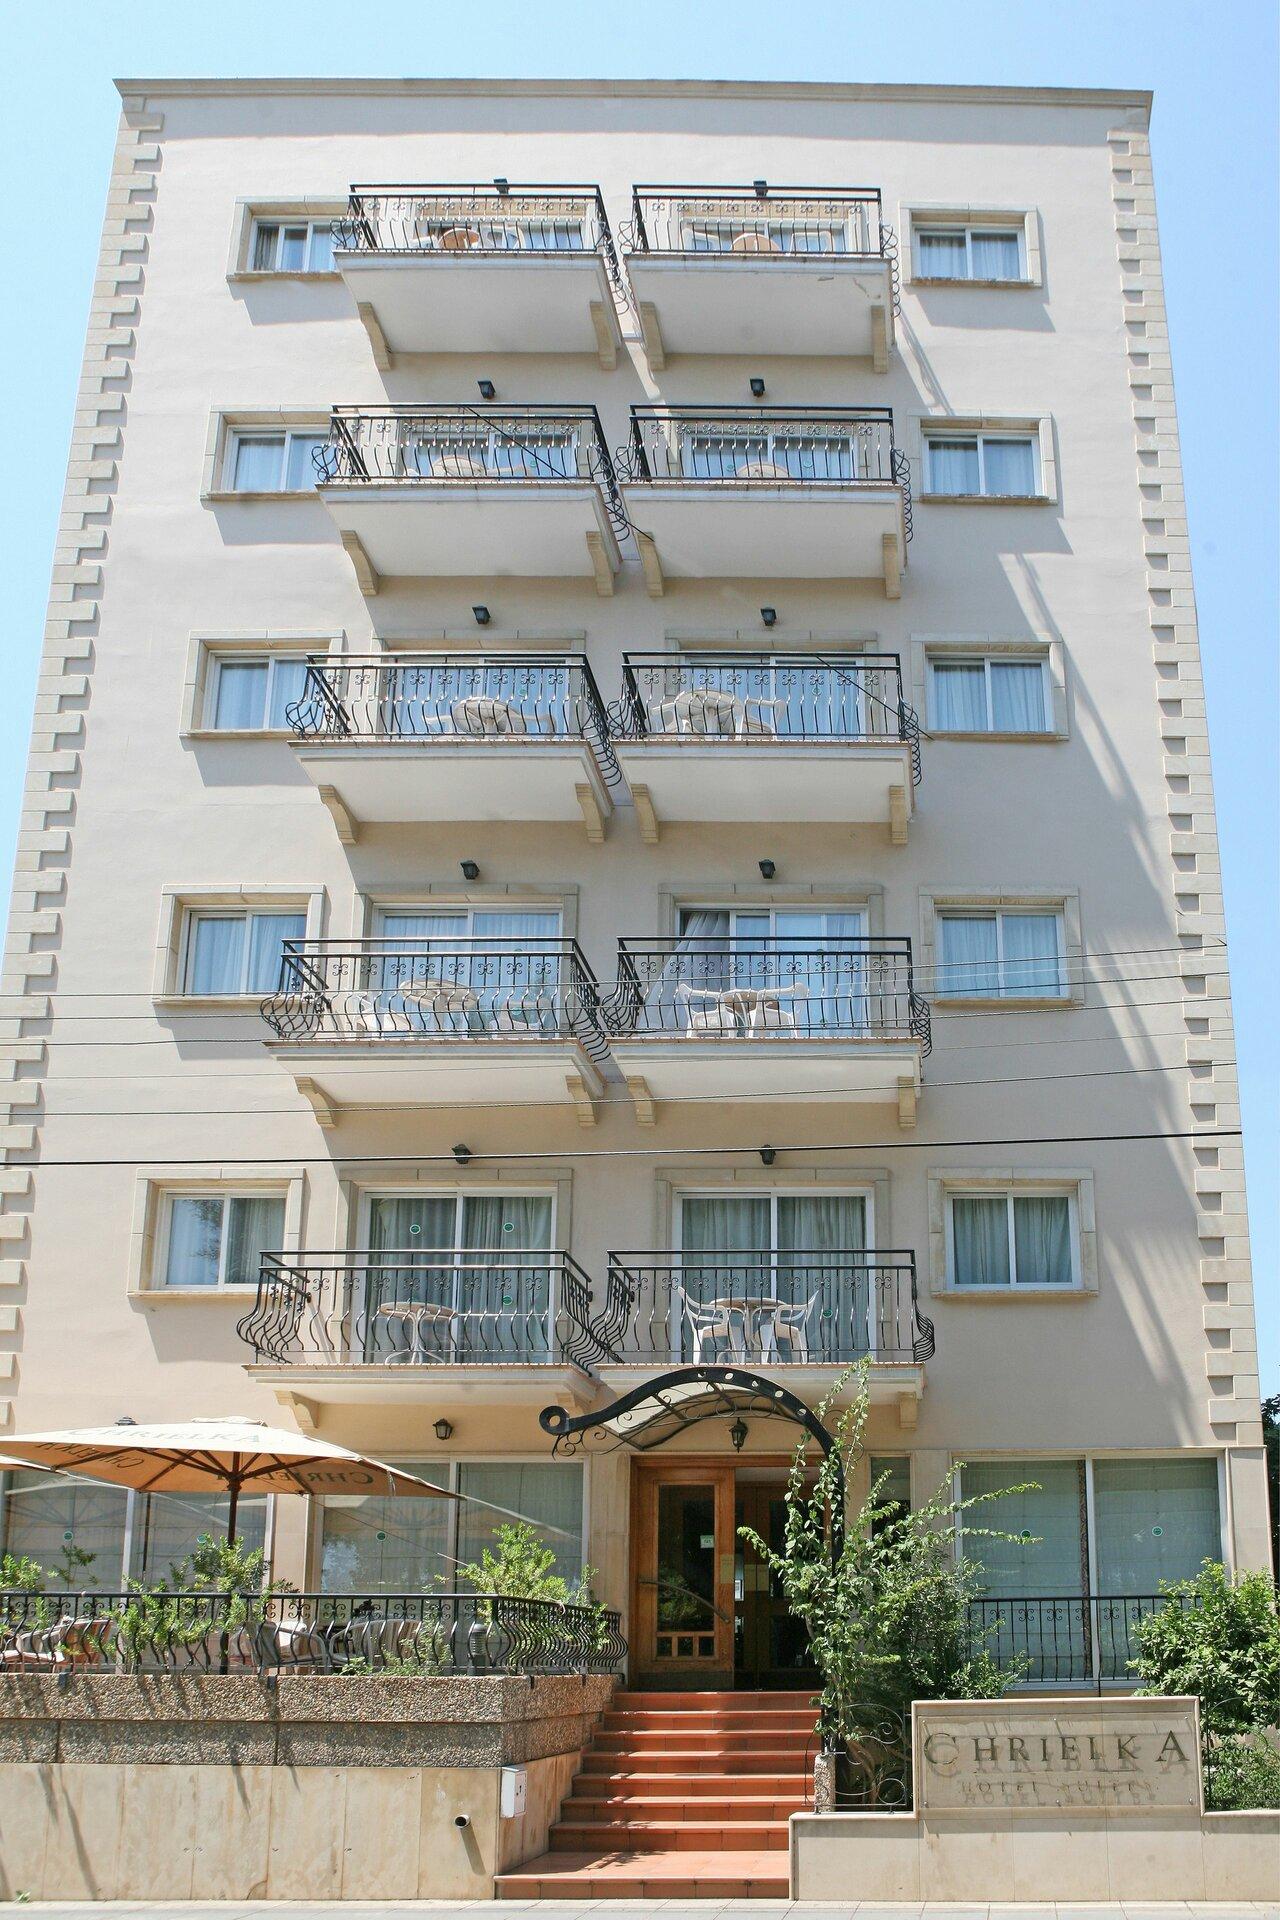 Chrielka Apartment